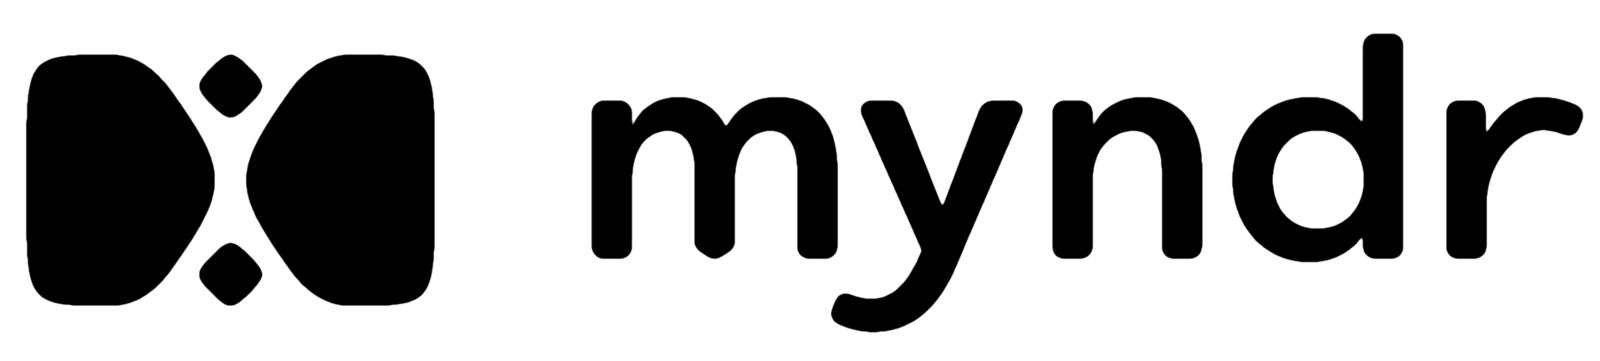 Myndr platform | Systeem status